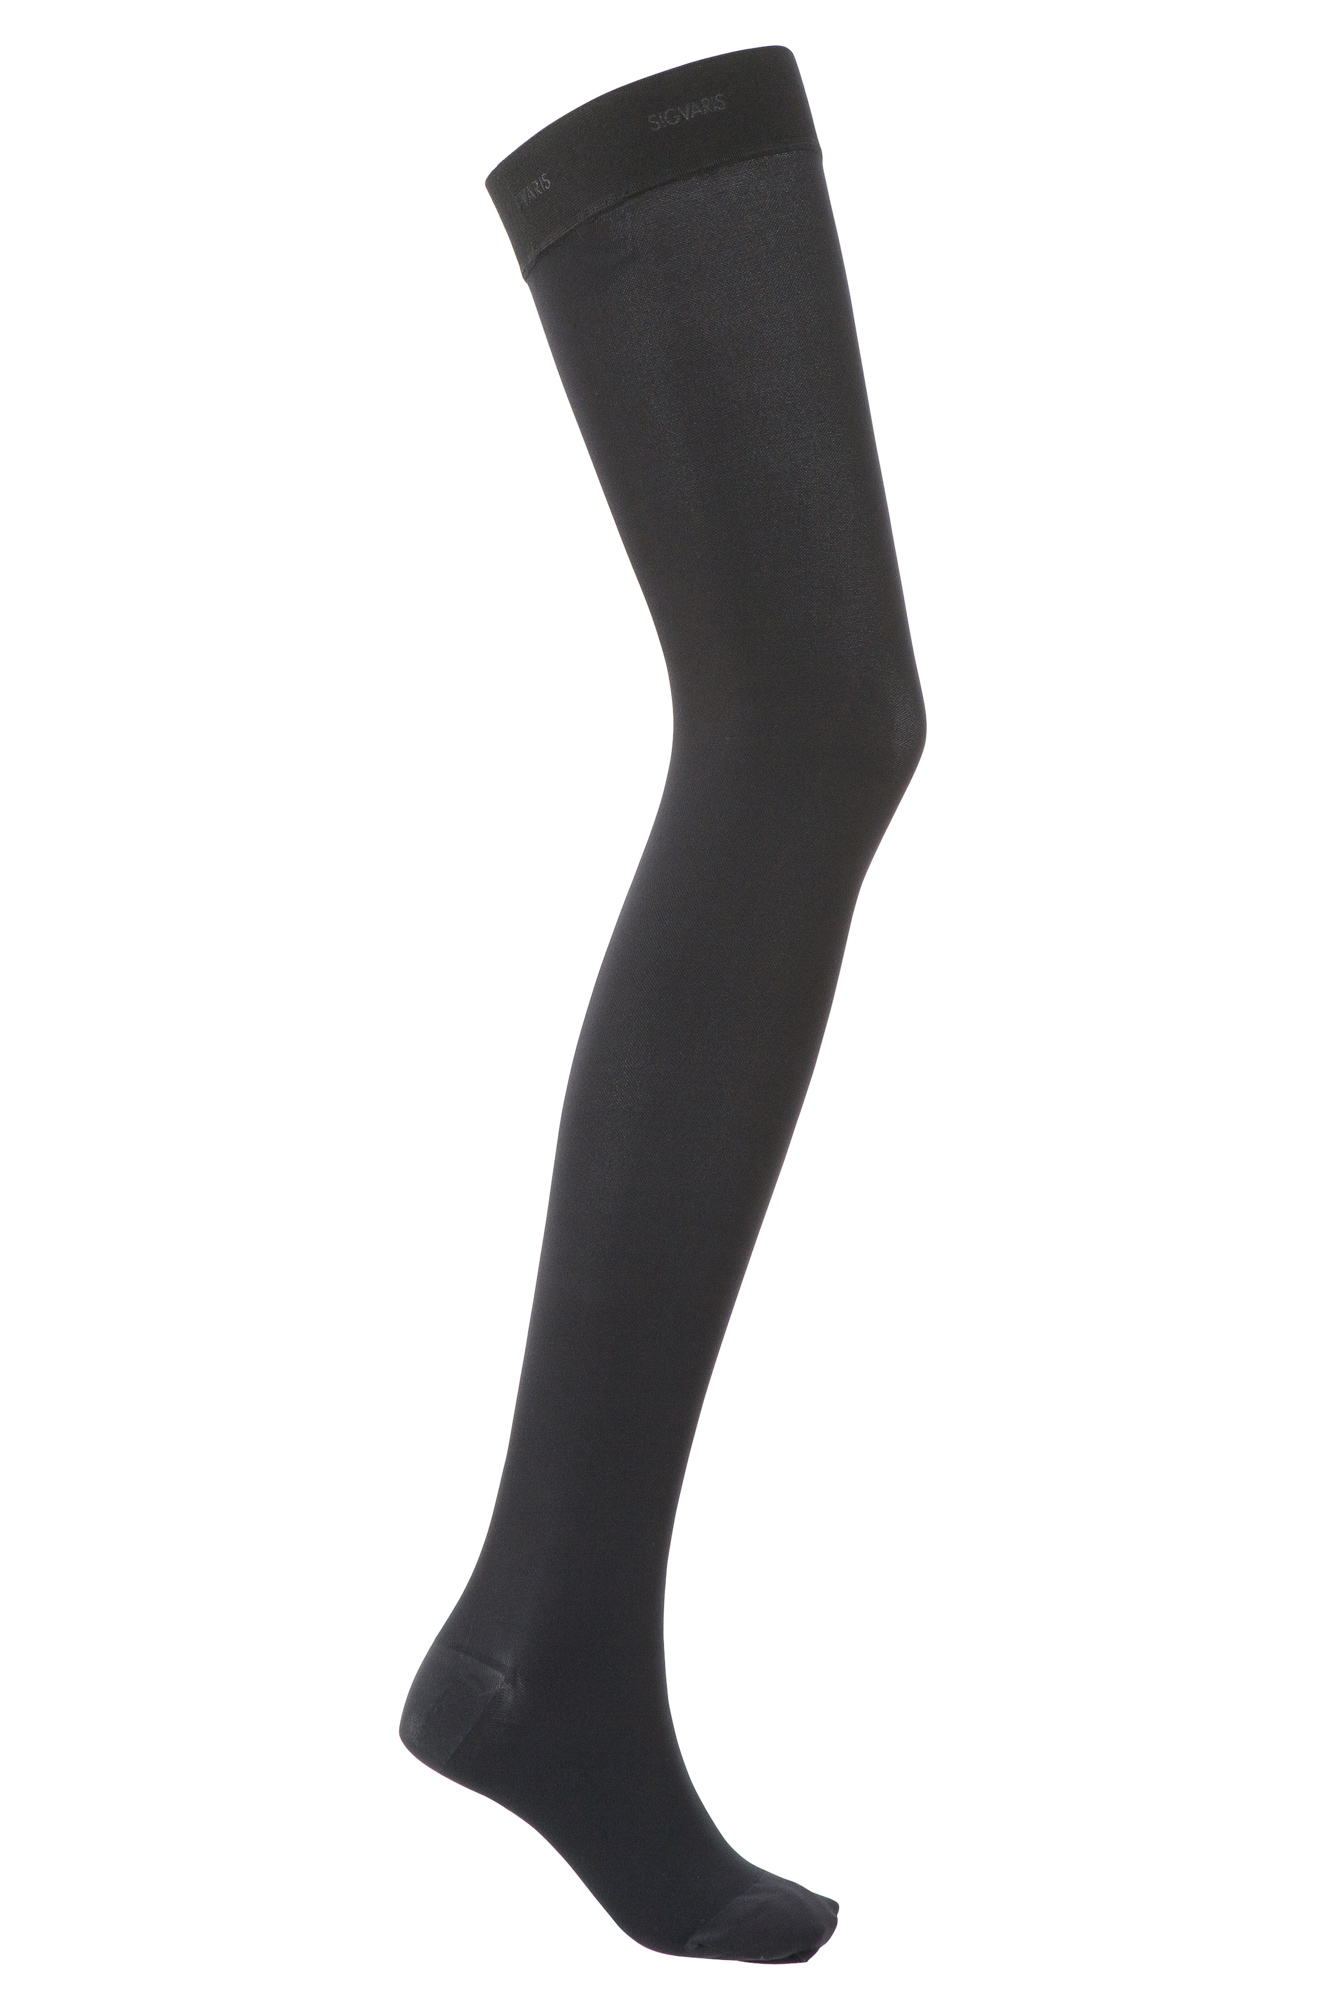 Sigvaris Comfort Class 1 Thigh Length Compression Stockings Savannah XLG Regular Long Open Toe